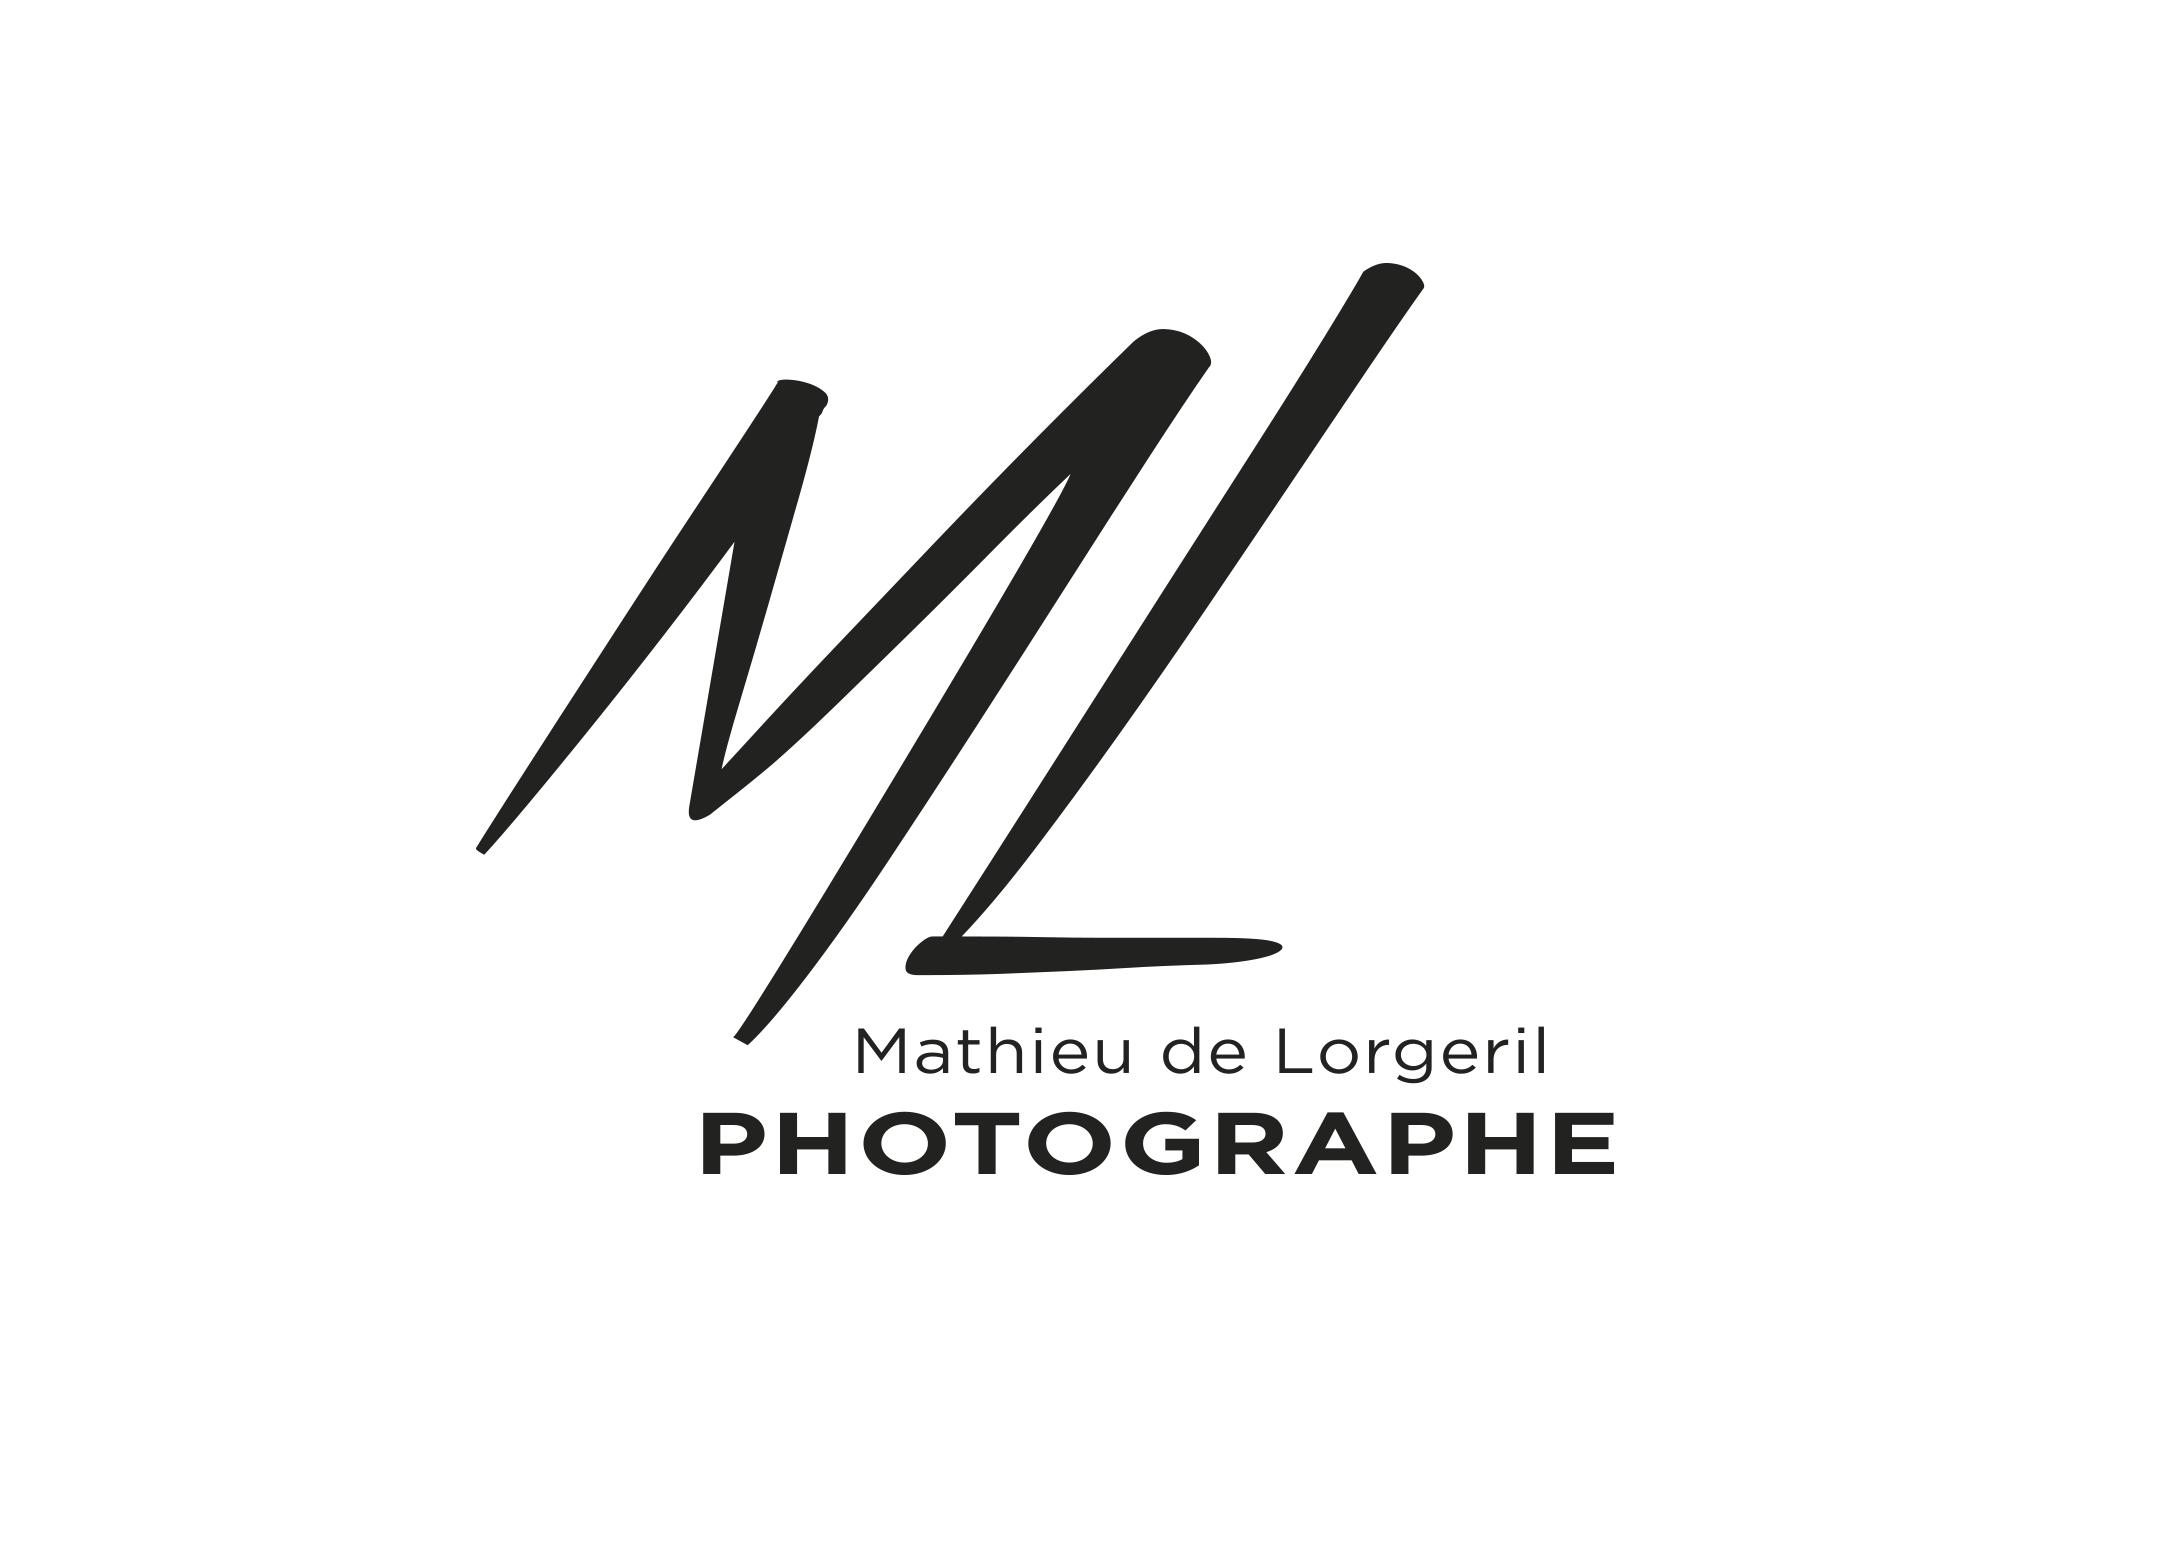 Mathieu de Lorgeril Photographe